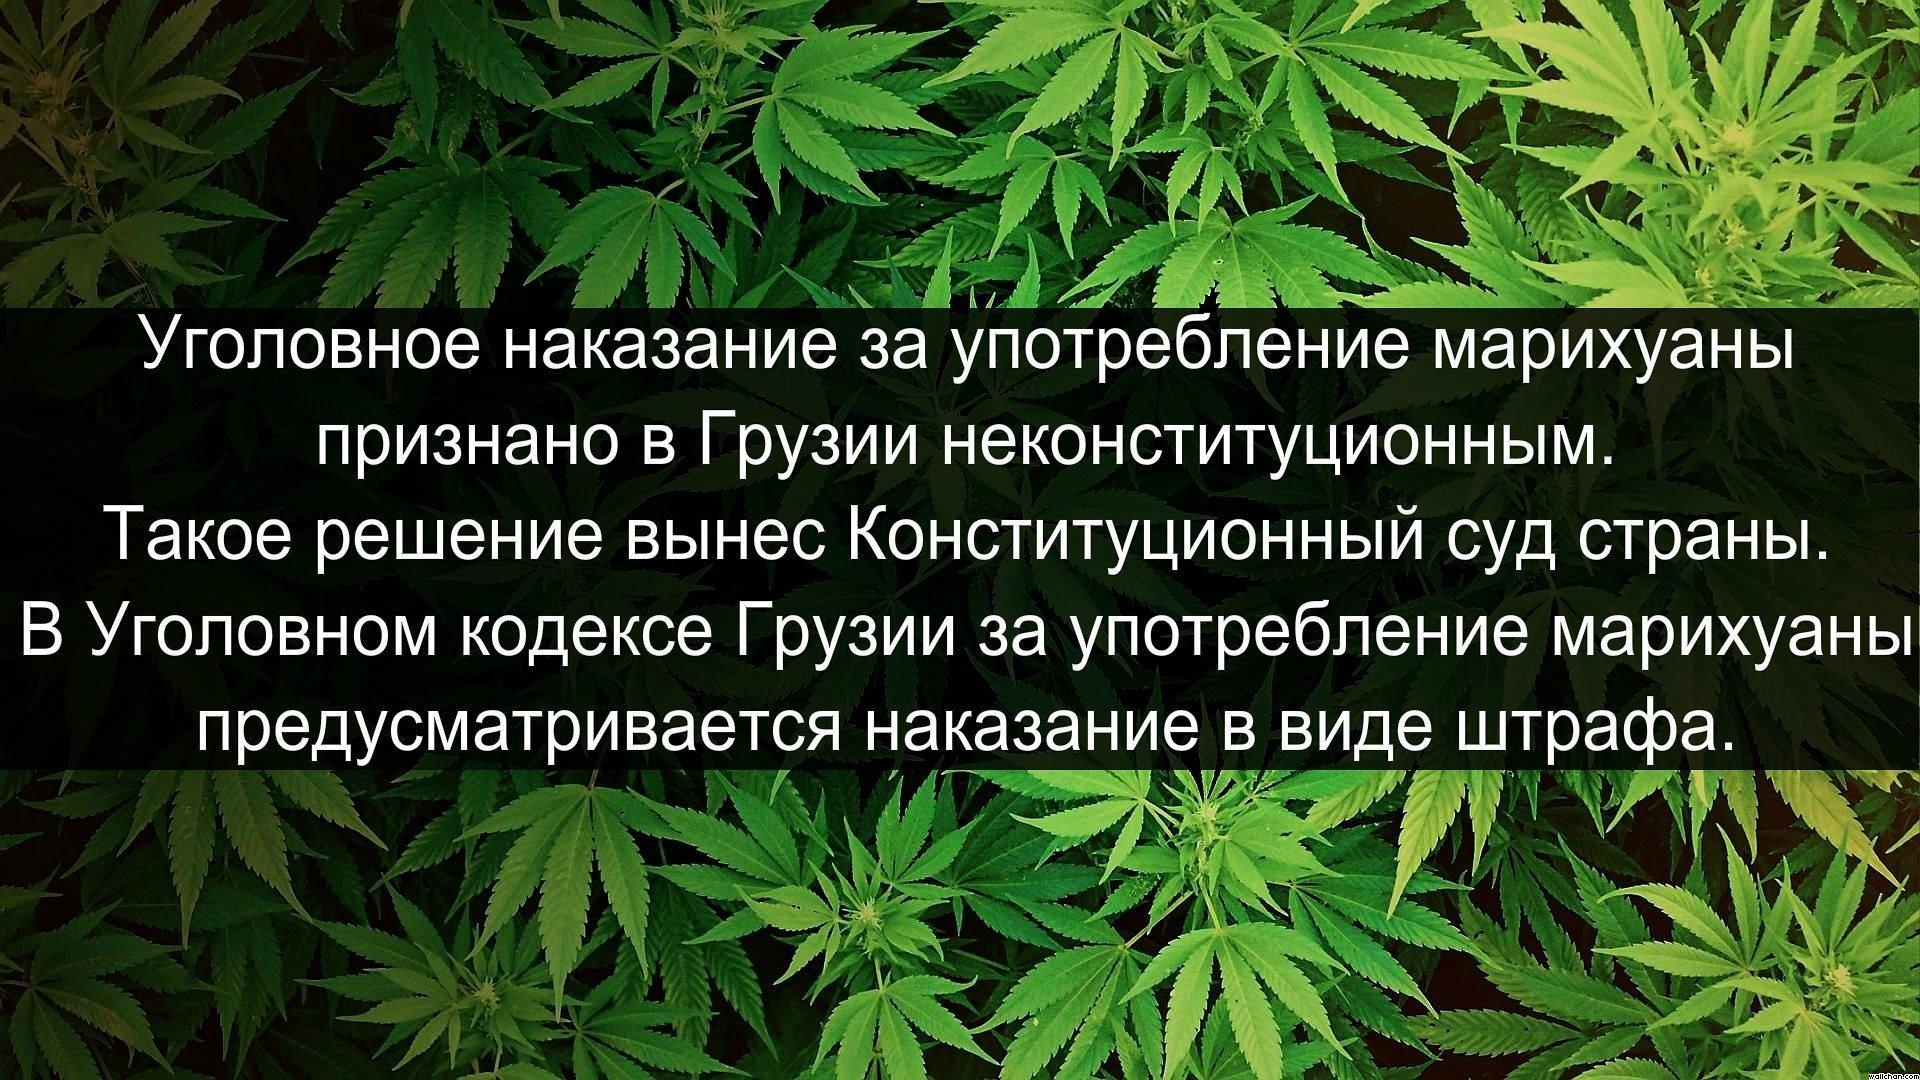 Марихуану назад курил неделю марихуане кадмий в